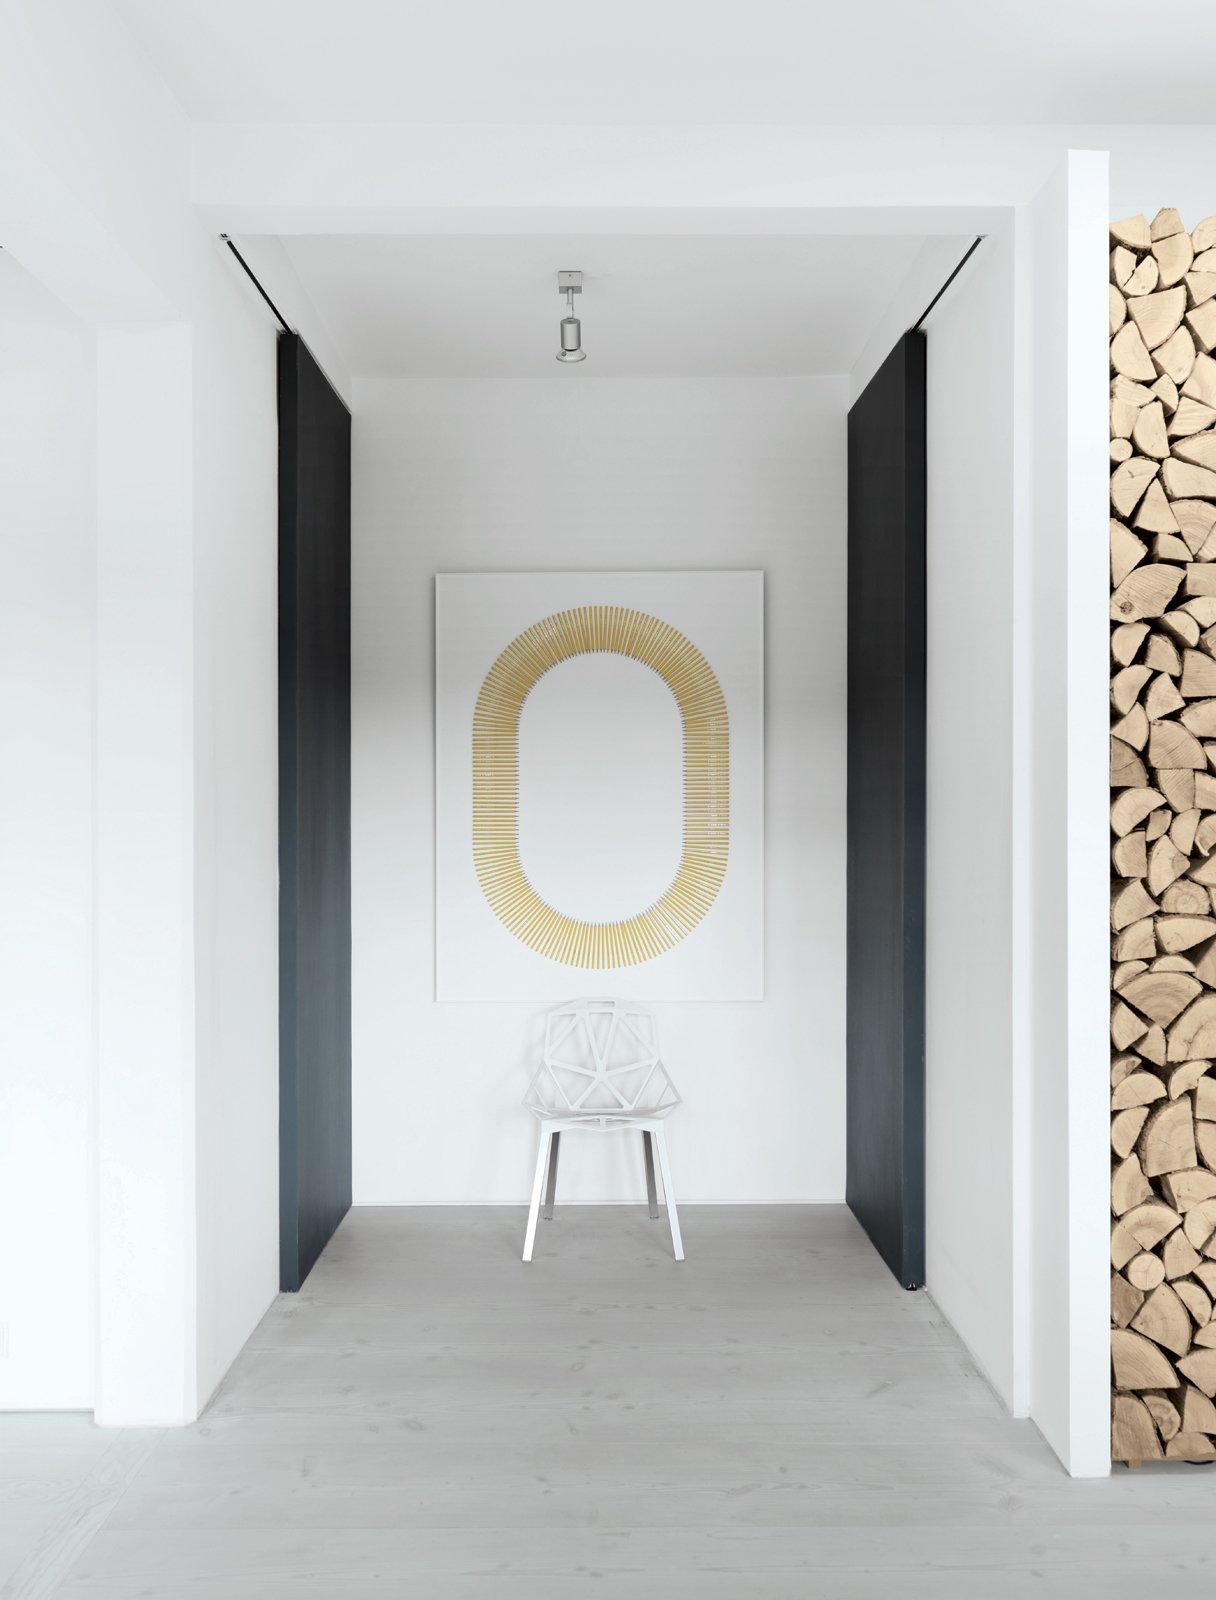 #seatingdesign #chair #interior #wood #inside #minimalist #modern #modernism #Copenhagen #loft #Chair_One #KonstantinGrcic #Magis   100+ Best Modern Seating Designs